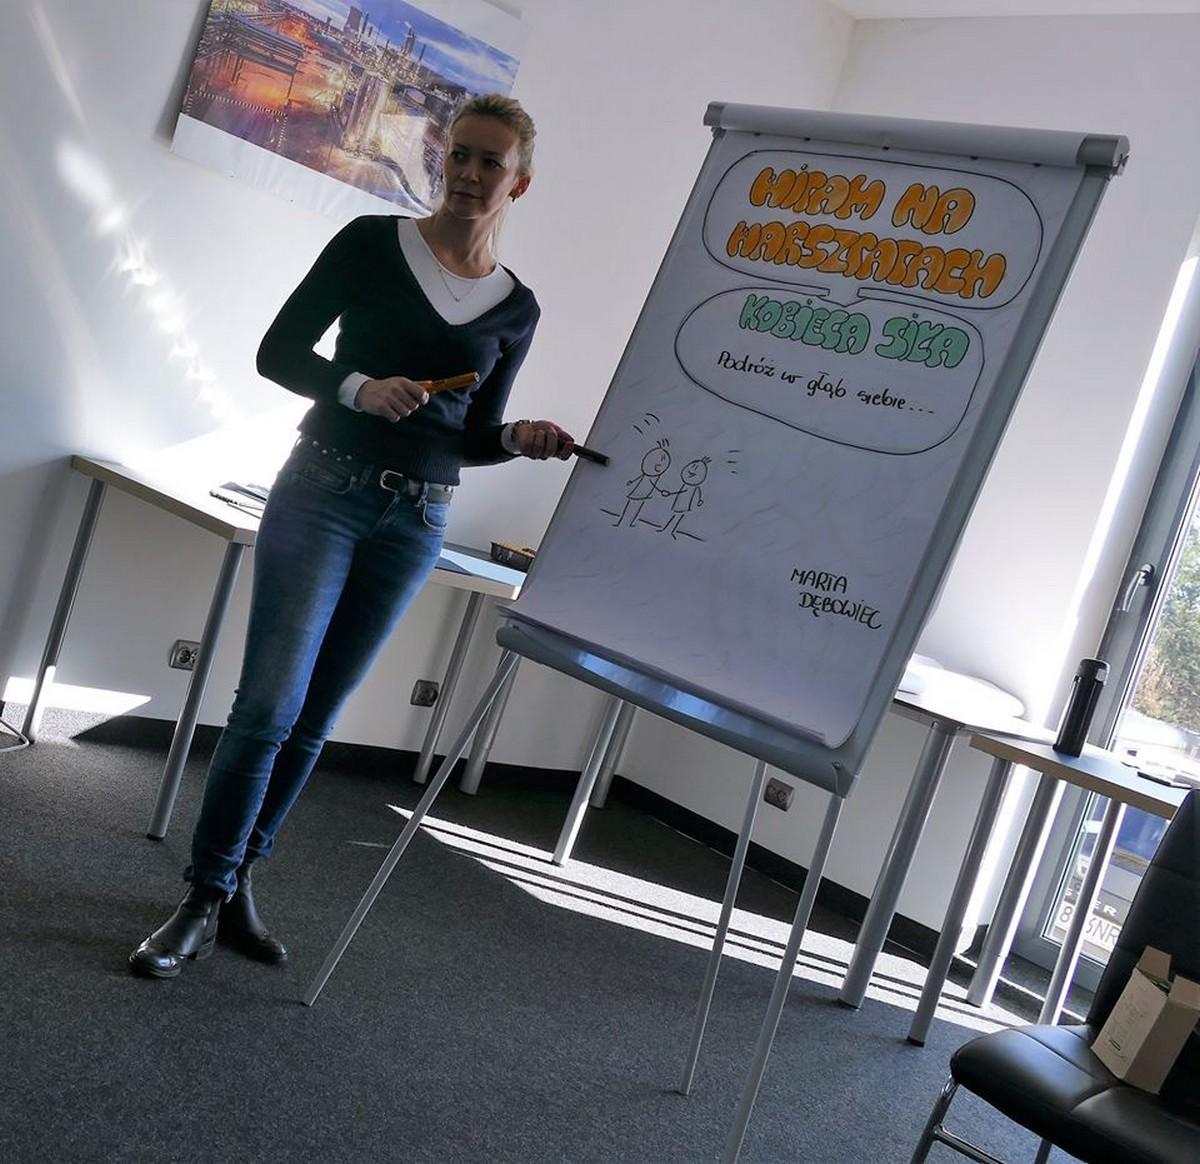 official_eleganse_strona_szkolenia_marta_debowiec_2_005